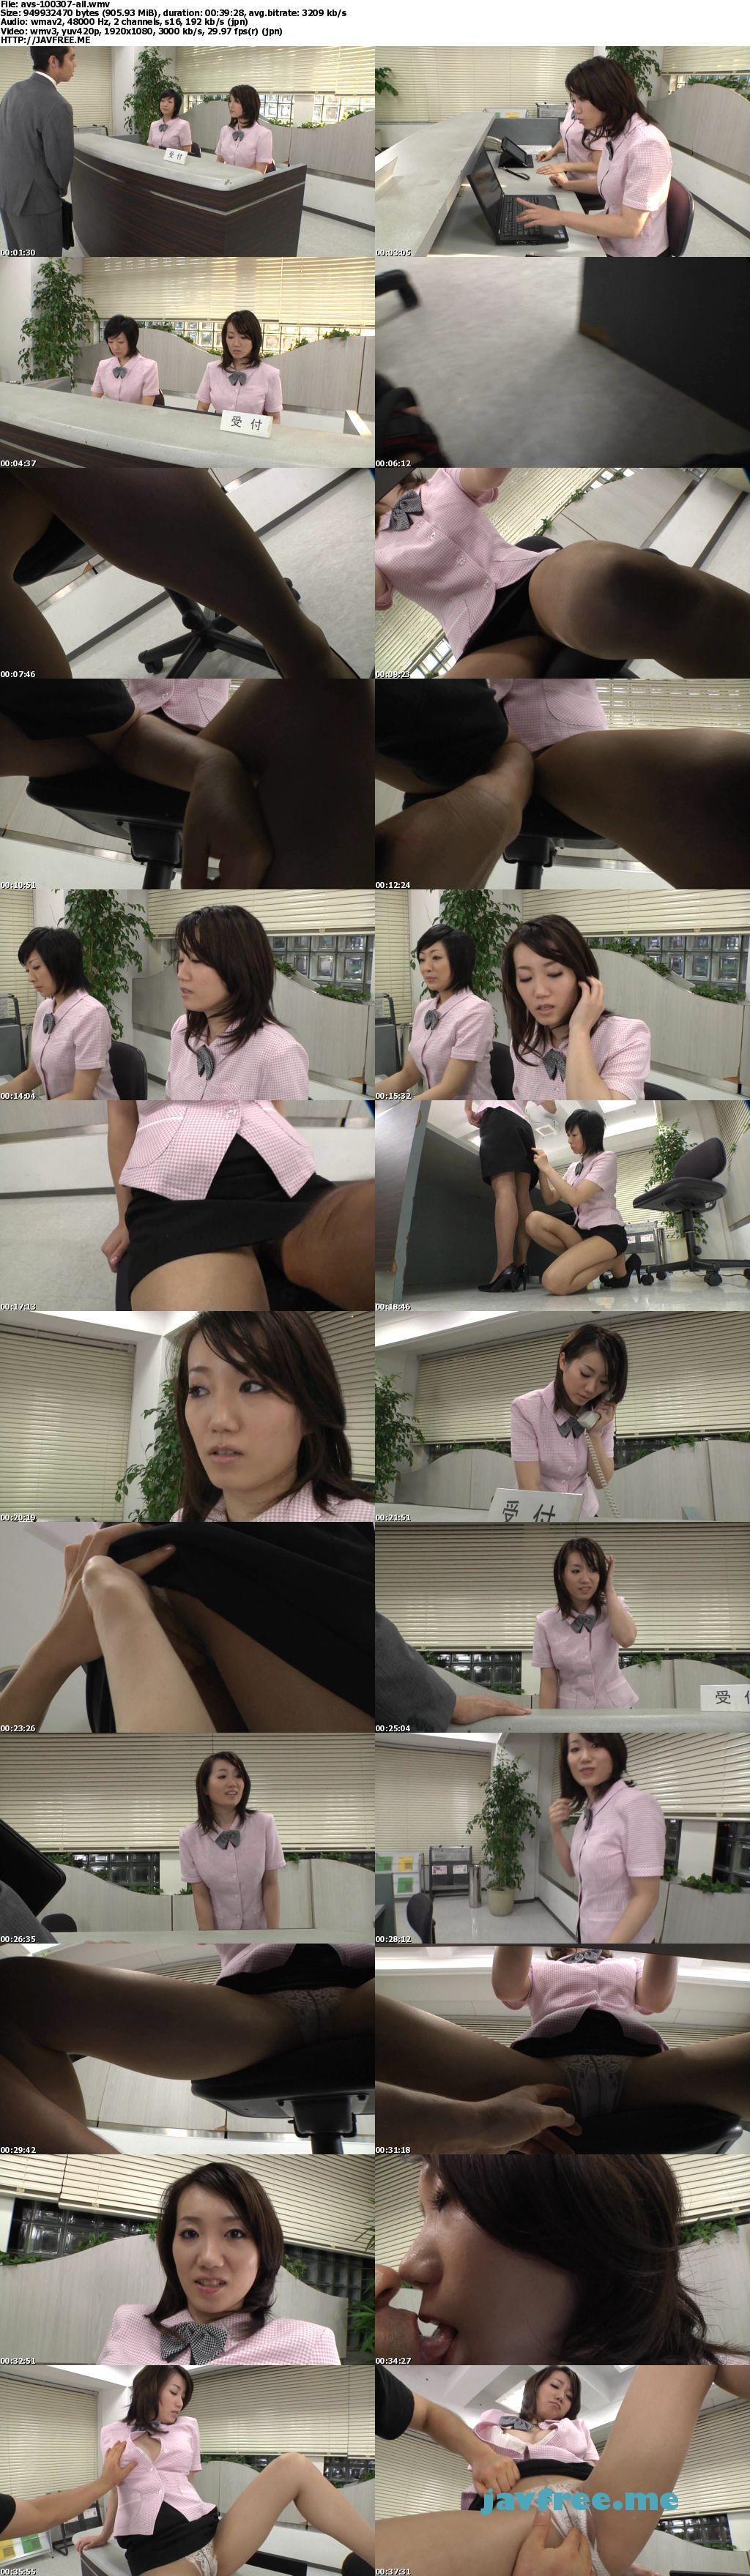 [DPHN 132] 非日常的悶絶遊戯 受付嬢、さつきの場合 非日常的悶絶遊戯 陽向さつき DPHN